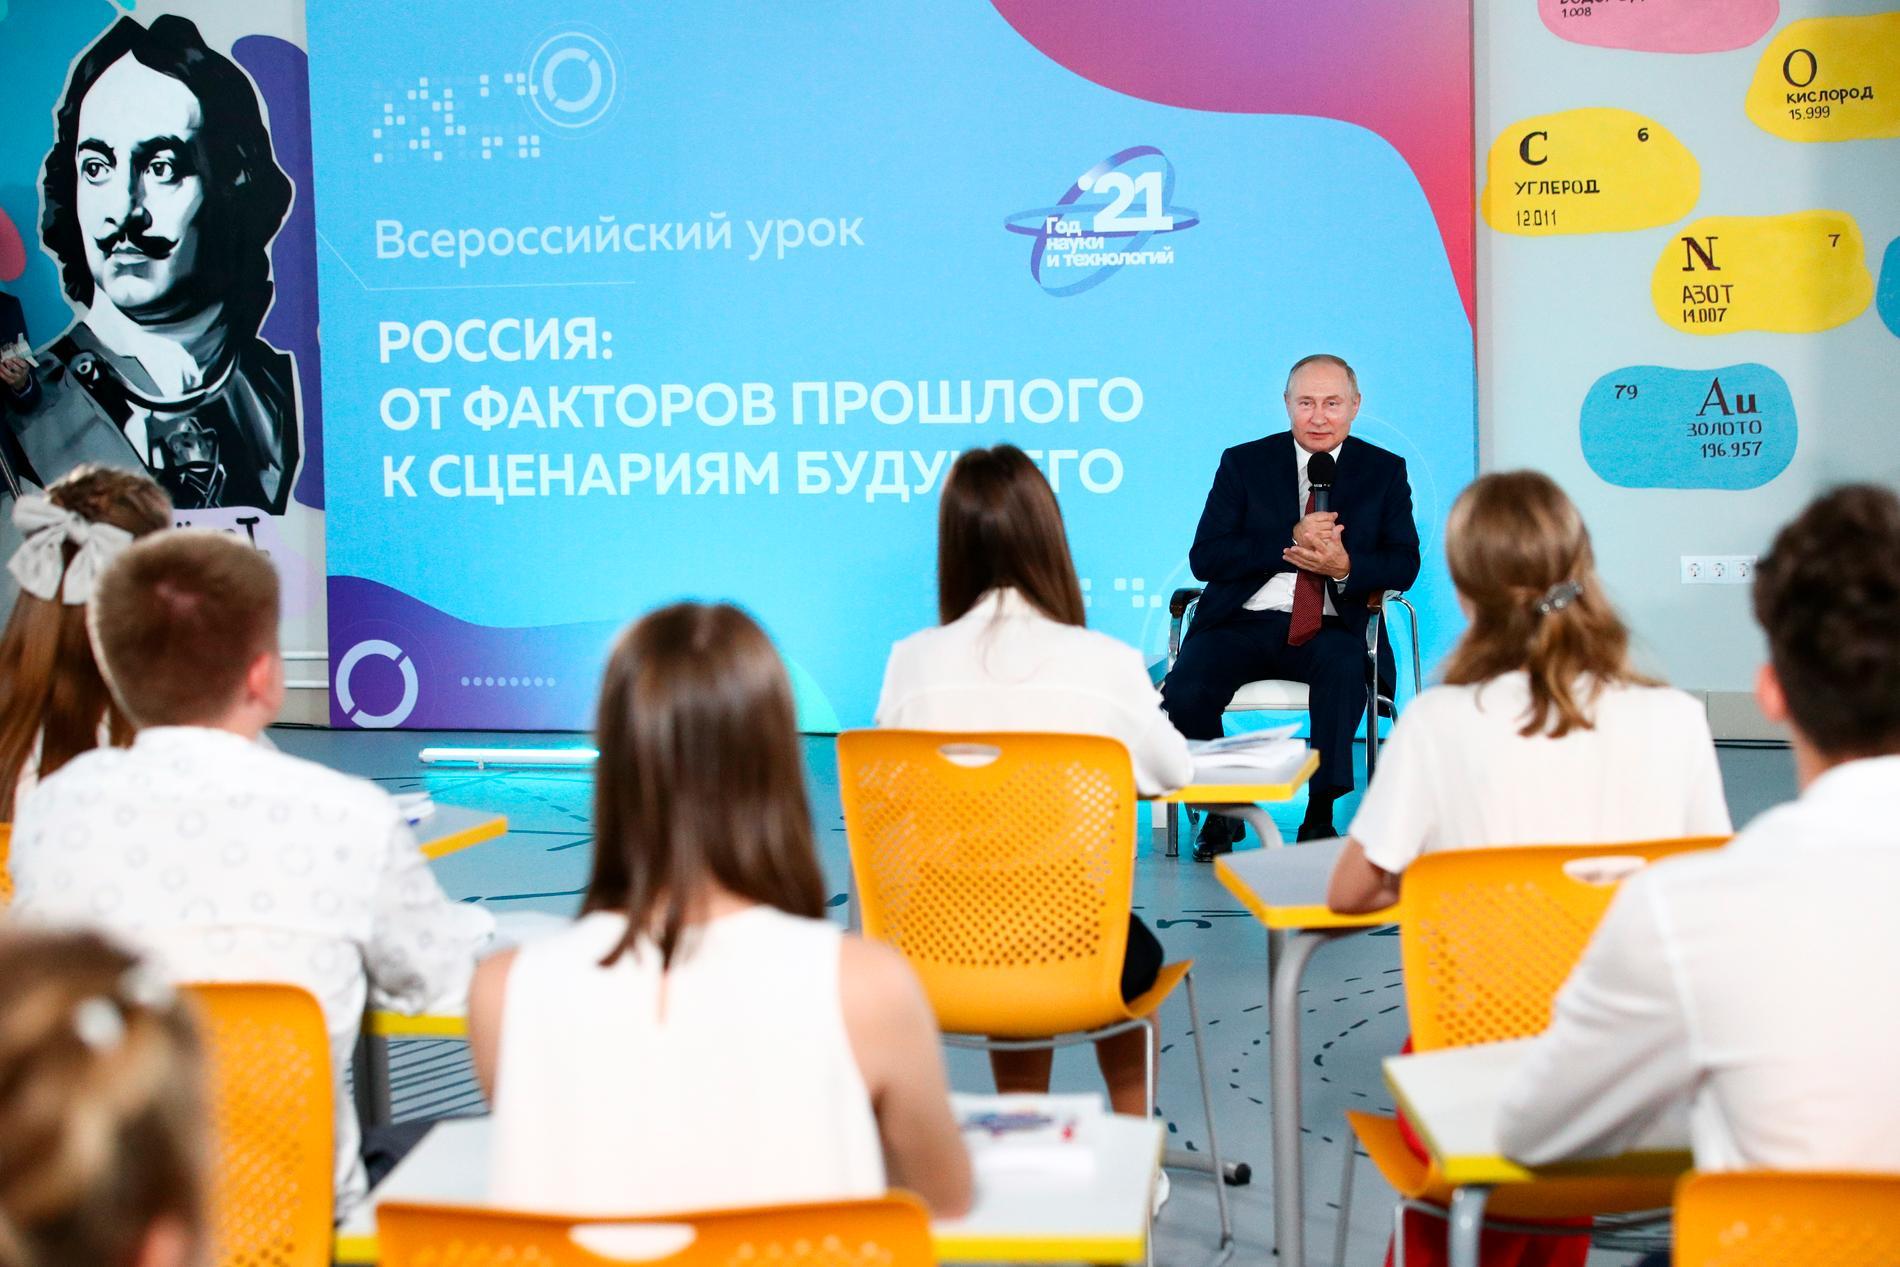 Rysslands president besökte en skola i Vladivostok.